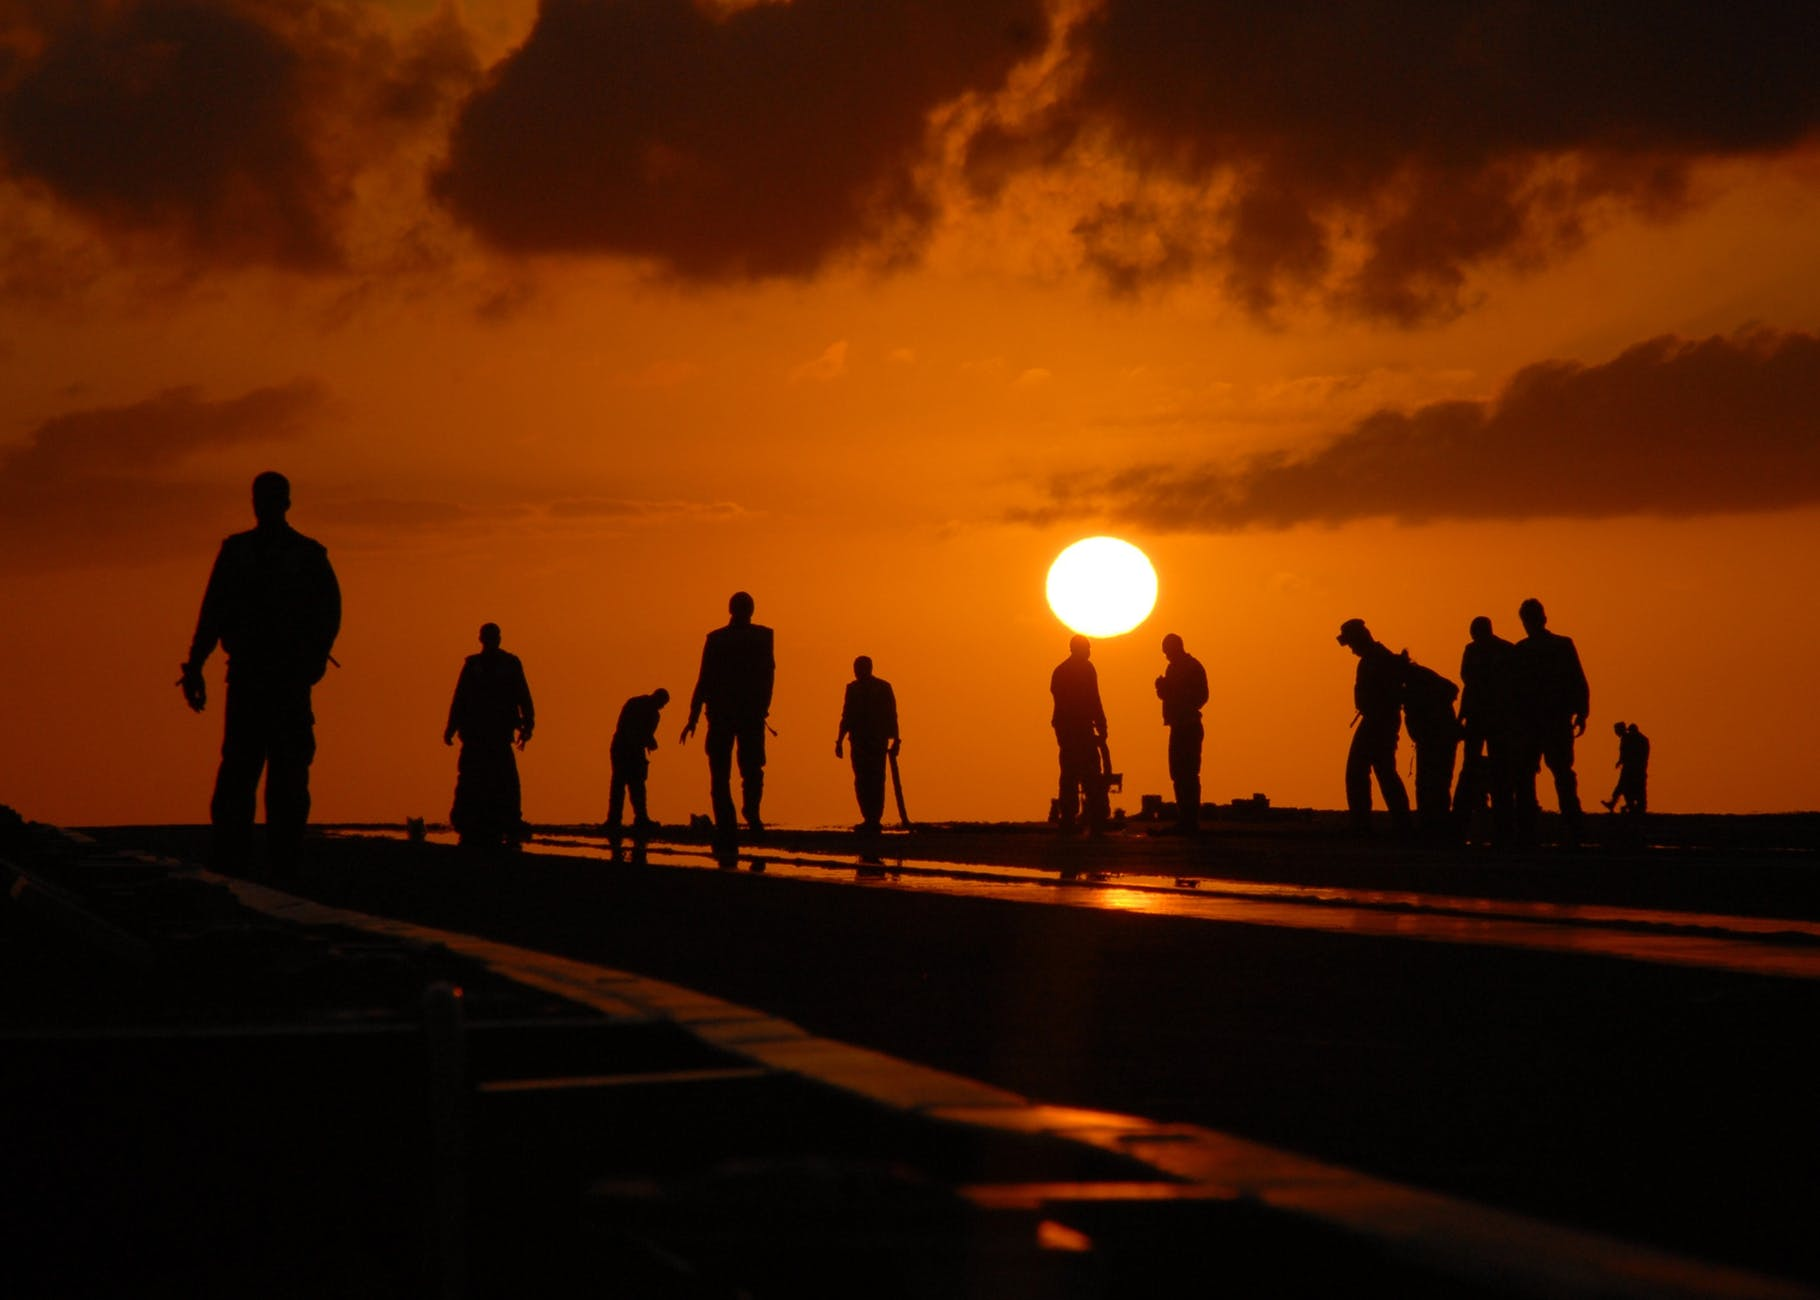 silhouettes-people-worker-dusk-40723.jpeg